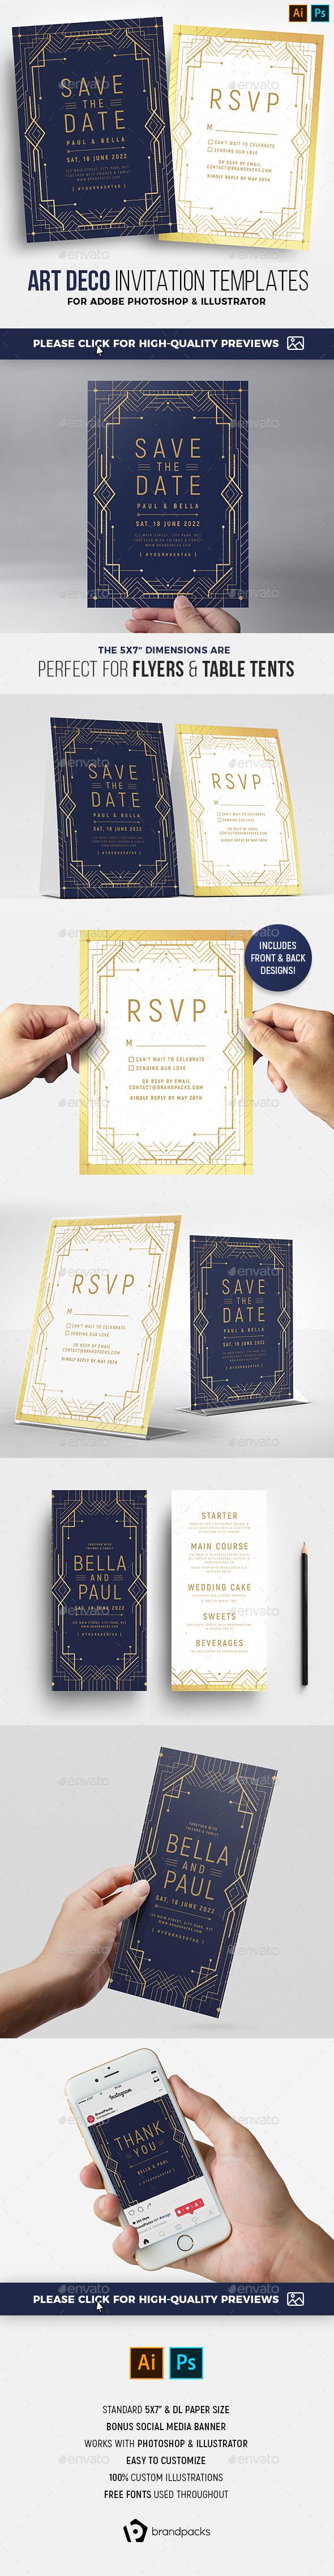 2020's Best Selling Wedding Invitation Templates